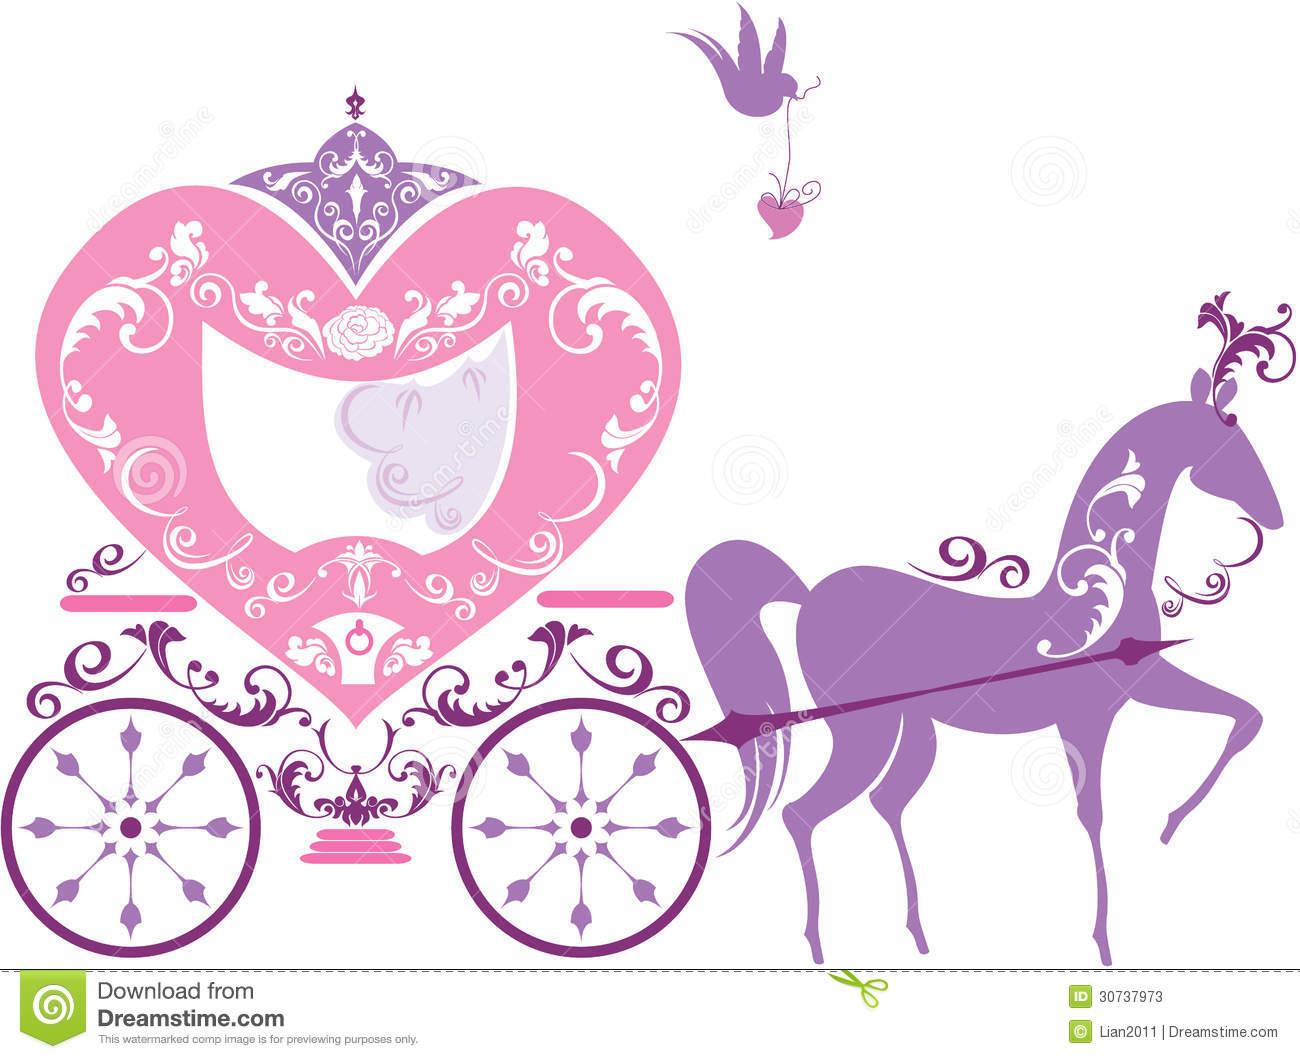 princess-carriage-clipart-fairytale-horse-carriage-sWEEKx-clipart.jpg